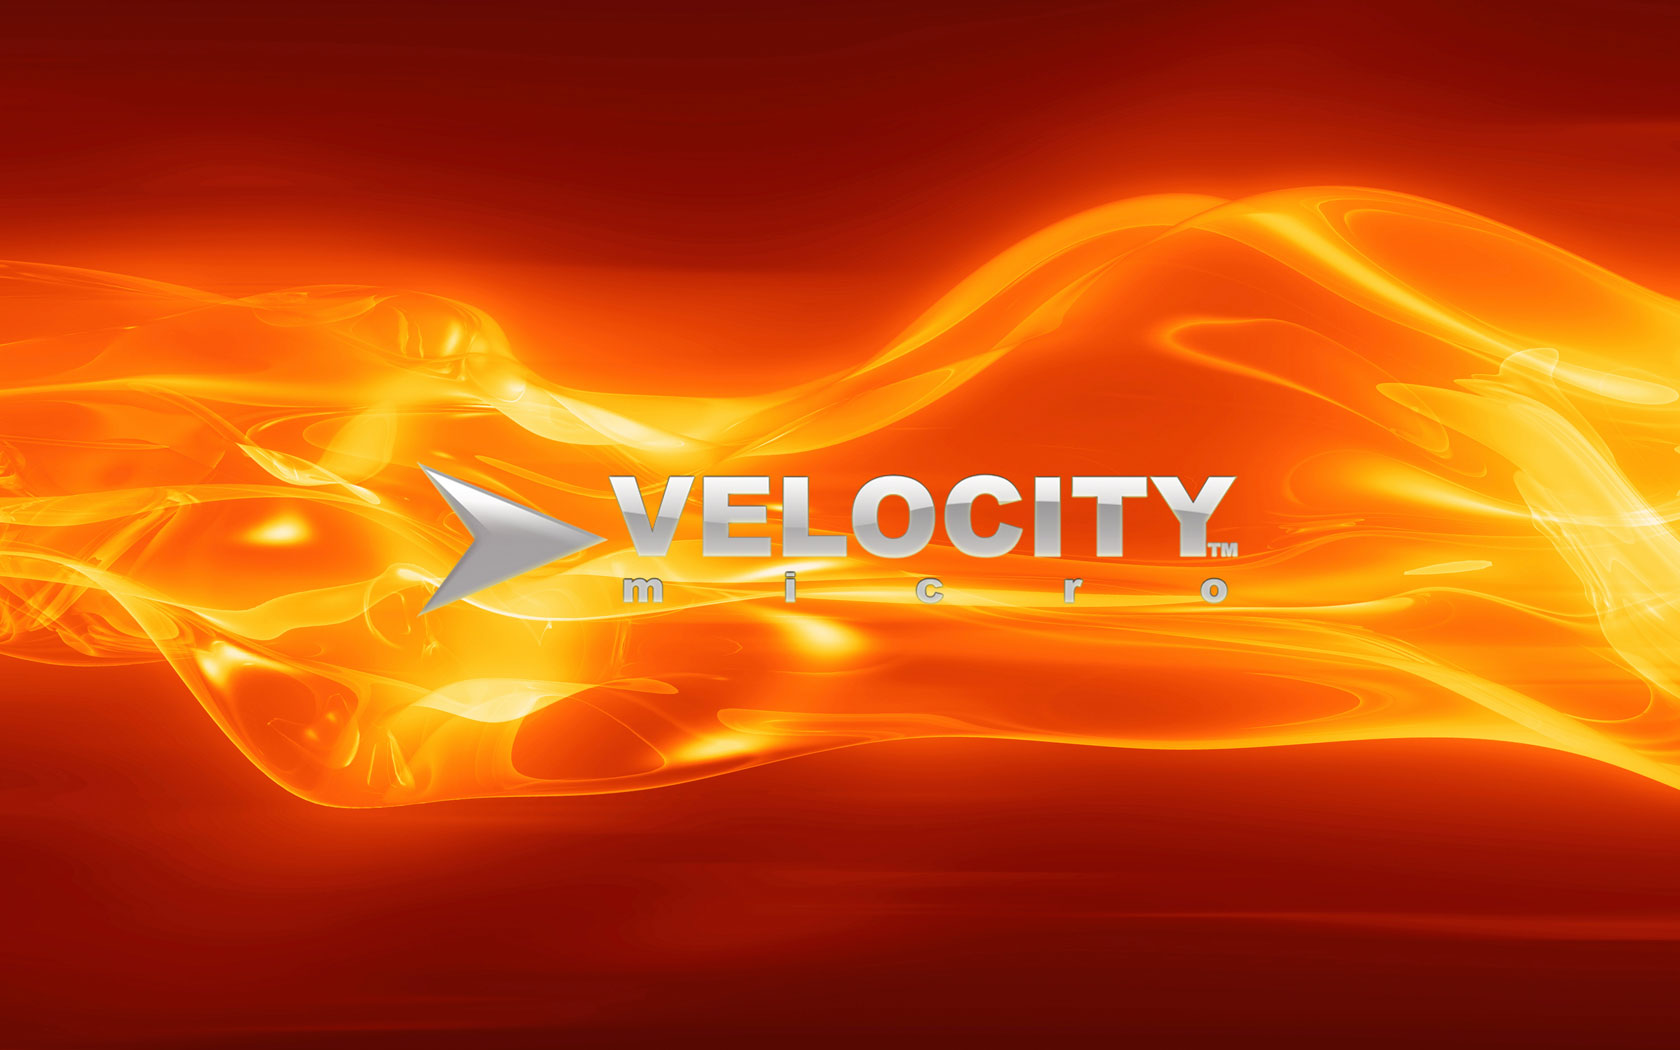 Velocity Micro Brand Resources - Wallpapers | Velocity Micro